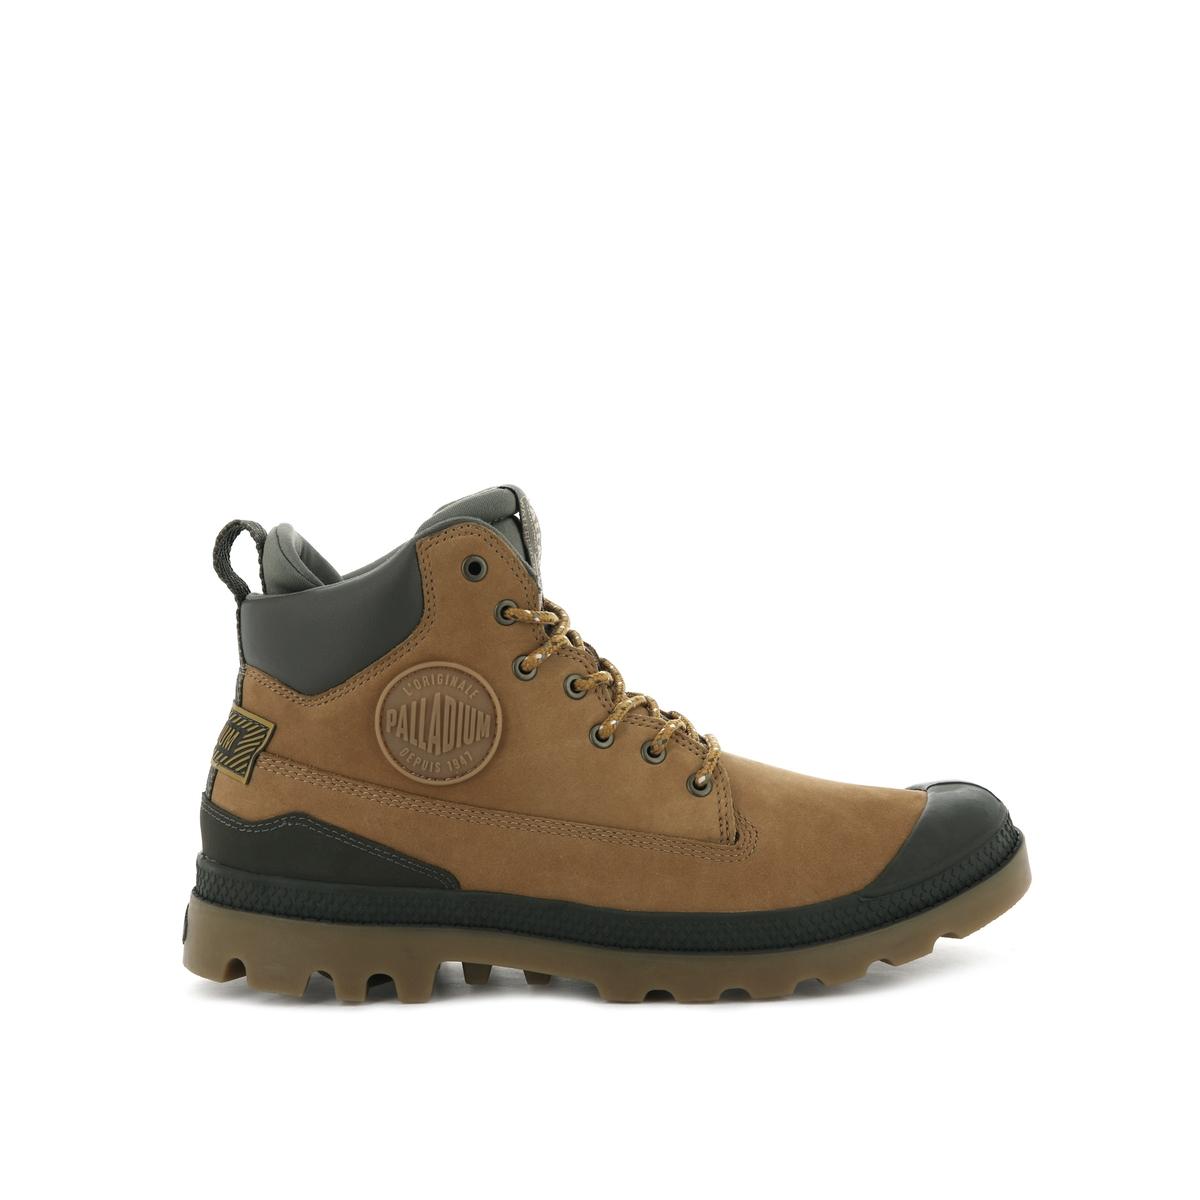 цена Ботинки La Redoute Кожаные Pampa SC Outsider WP 45 каштановый онлайн в 2017 году